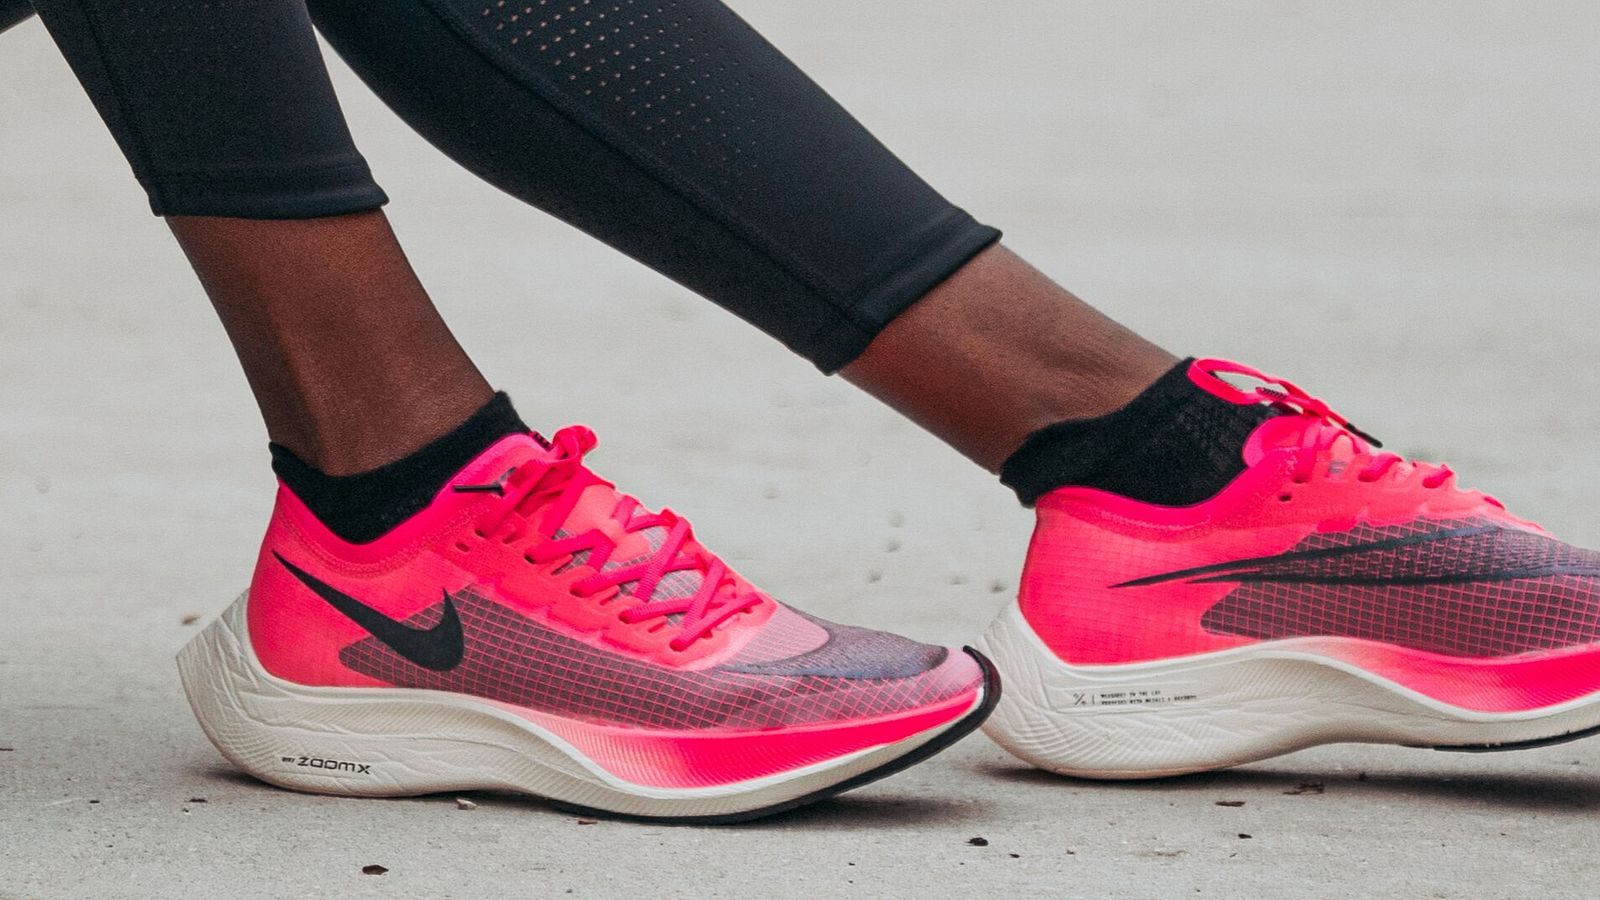 Shoe Review Nike Zoomx Vaporfly Next Fleet Feet